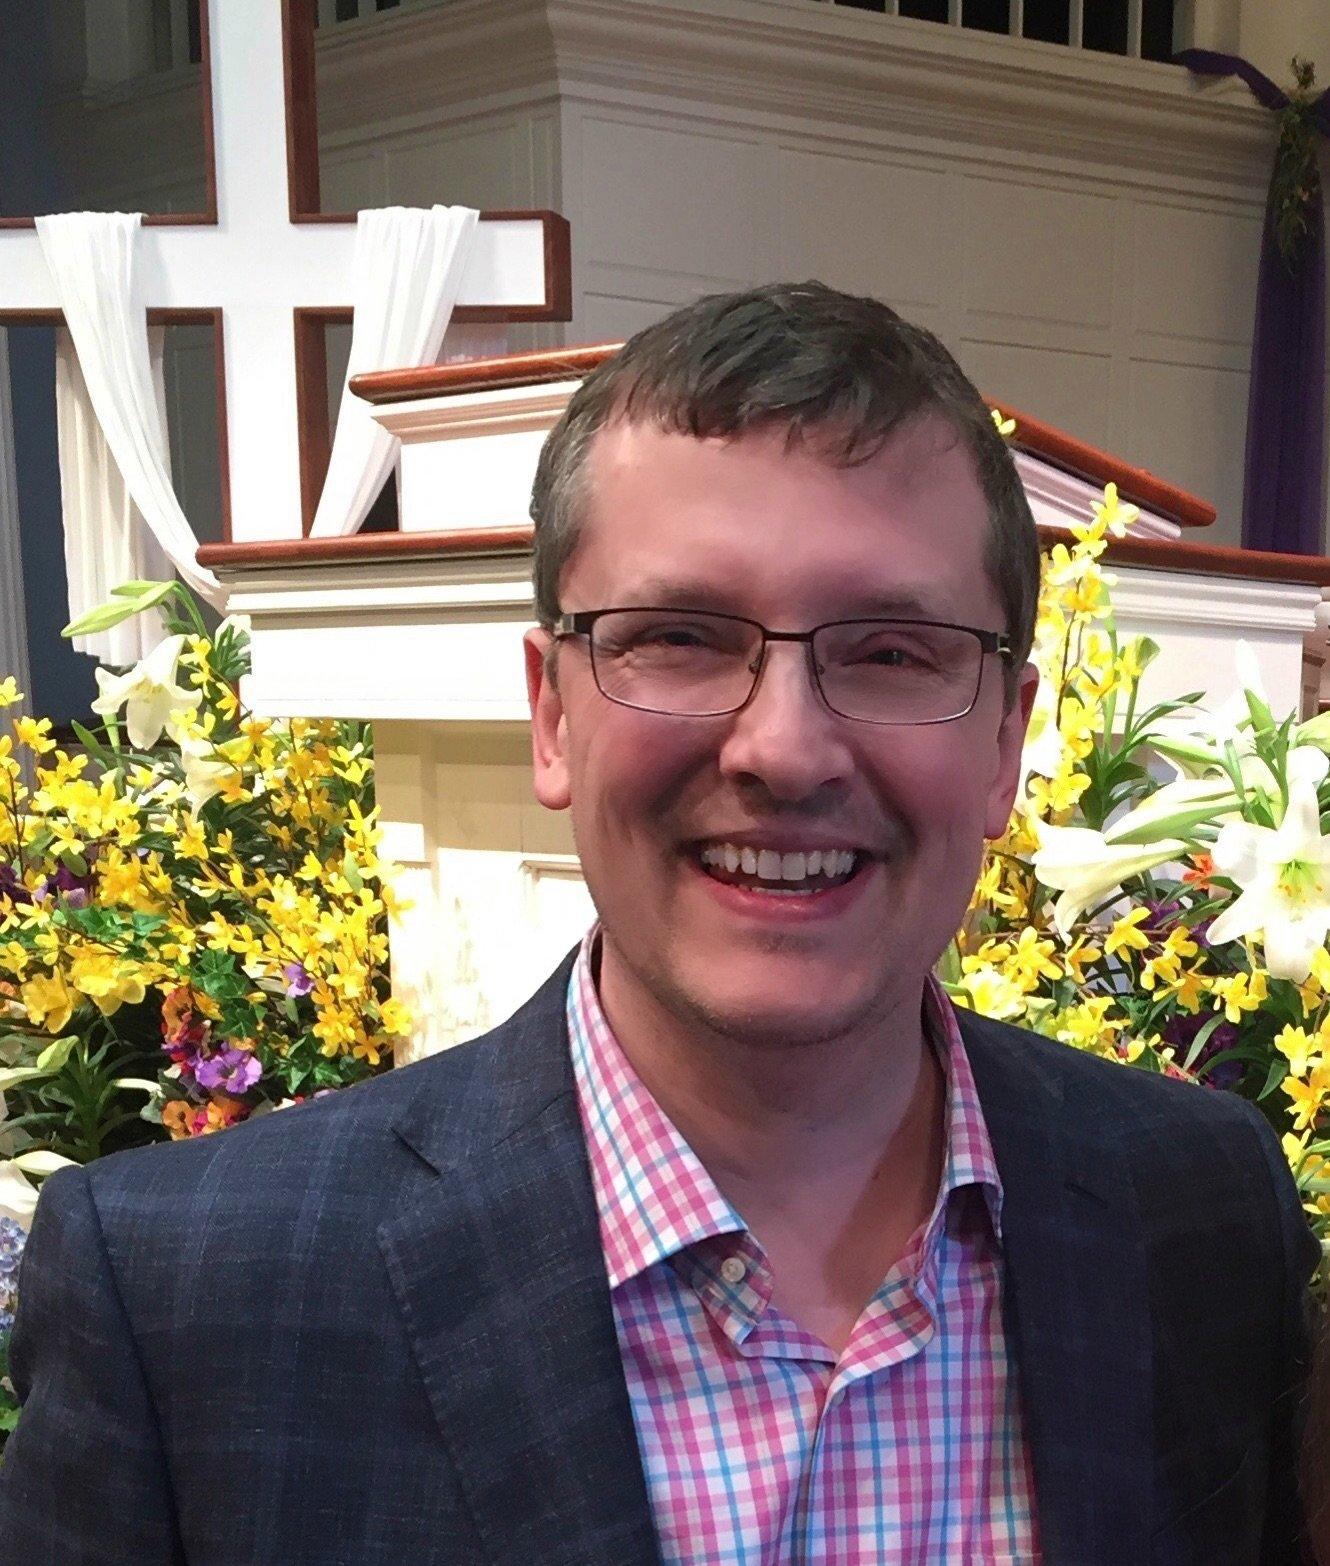 David Horton is the Upper School Mathematics instructor at Clapham School.